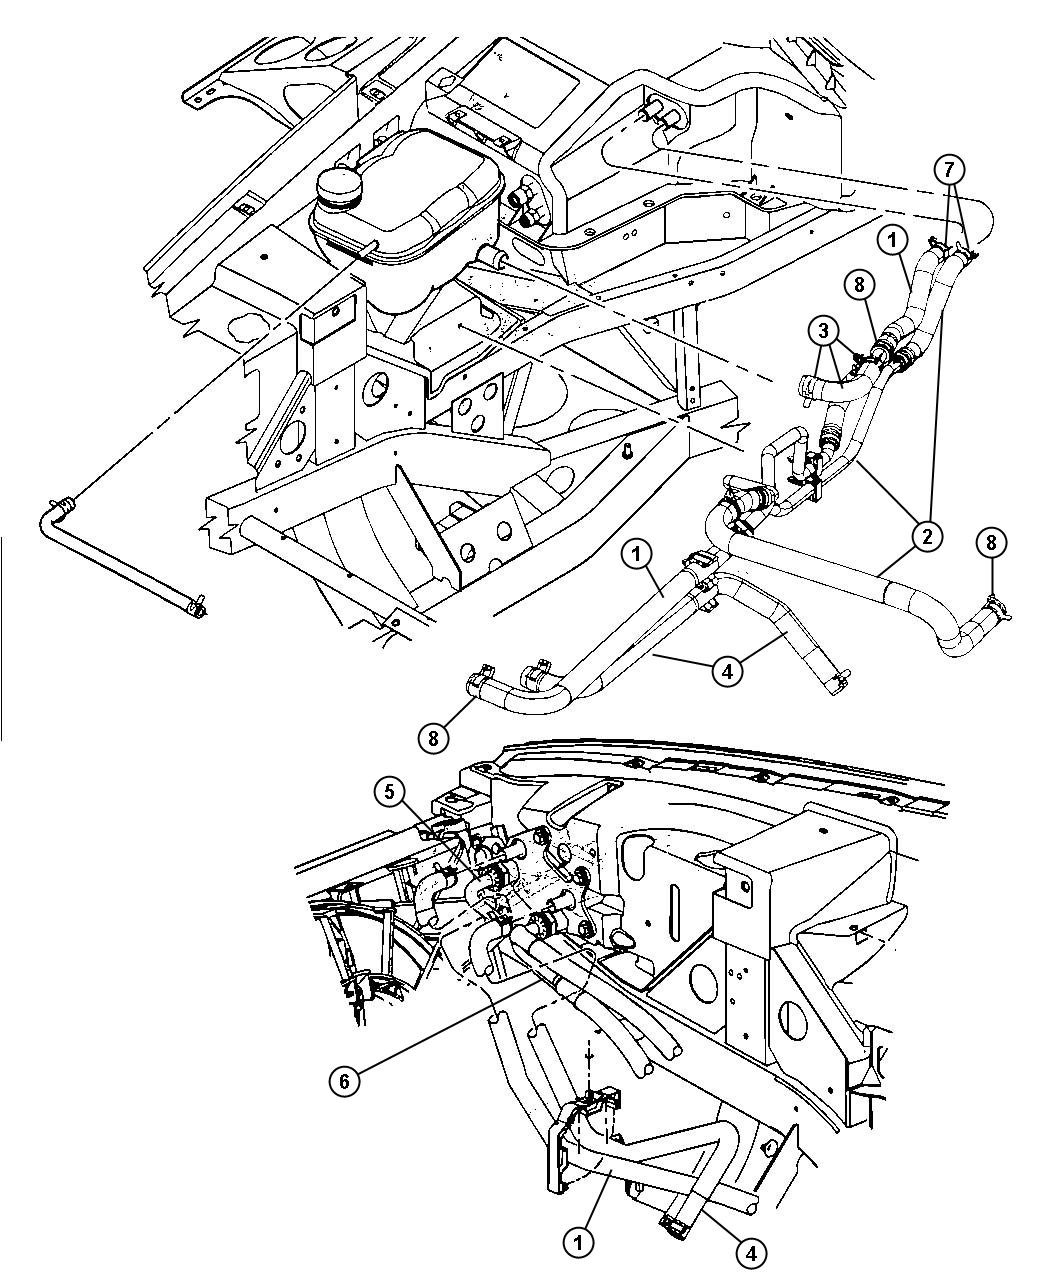 Dodge Viper Line Oil Cooler Inlet Engine Sfi Heater